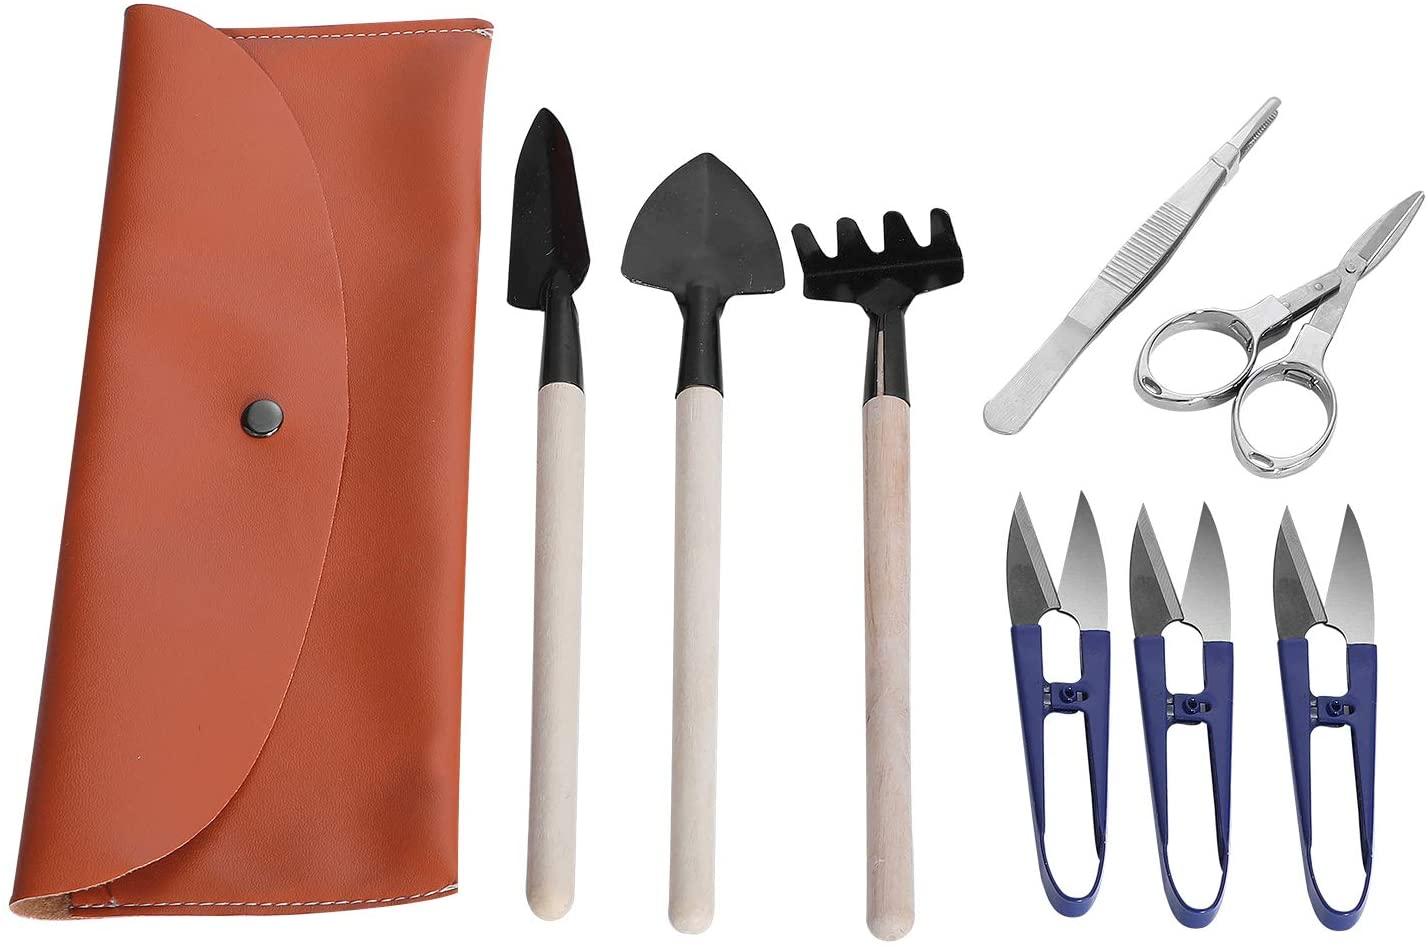 Bonsai Tool Kit 8 Pcs - Basic Trimmer Set Include Pruner, Fold Scissors, Tweezer, Spades and Rake by Sanlykate